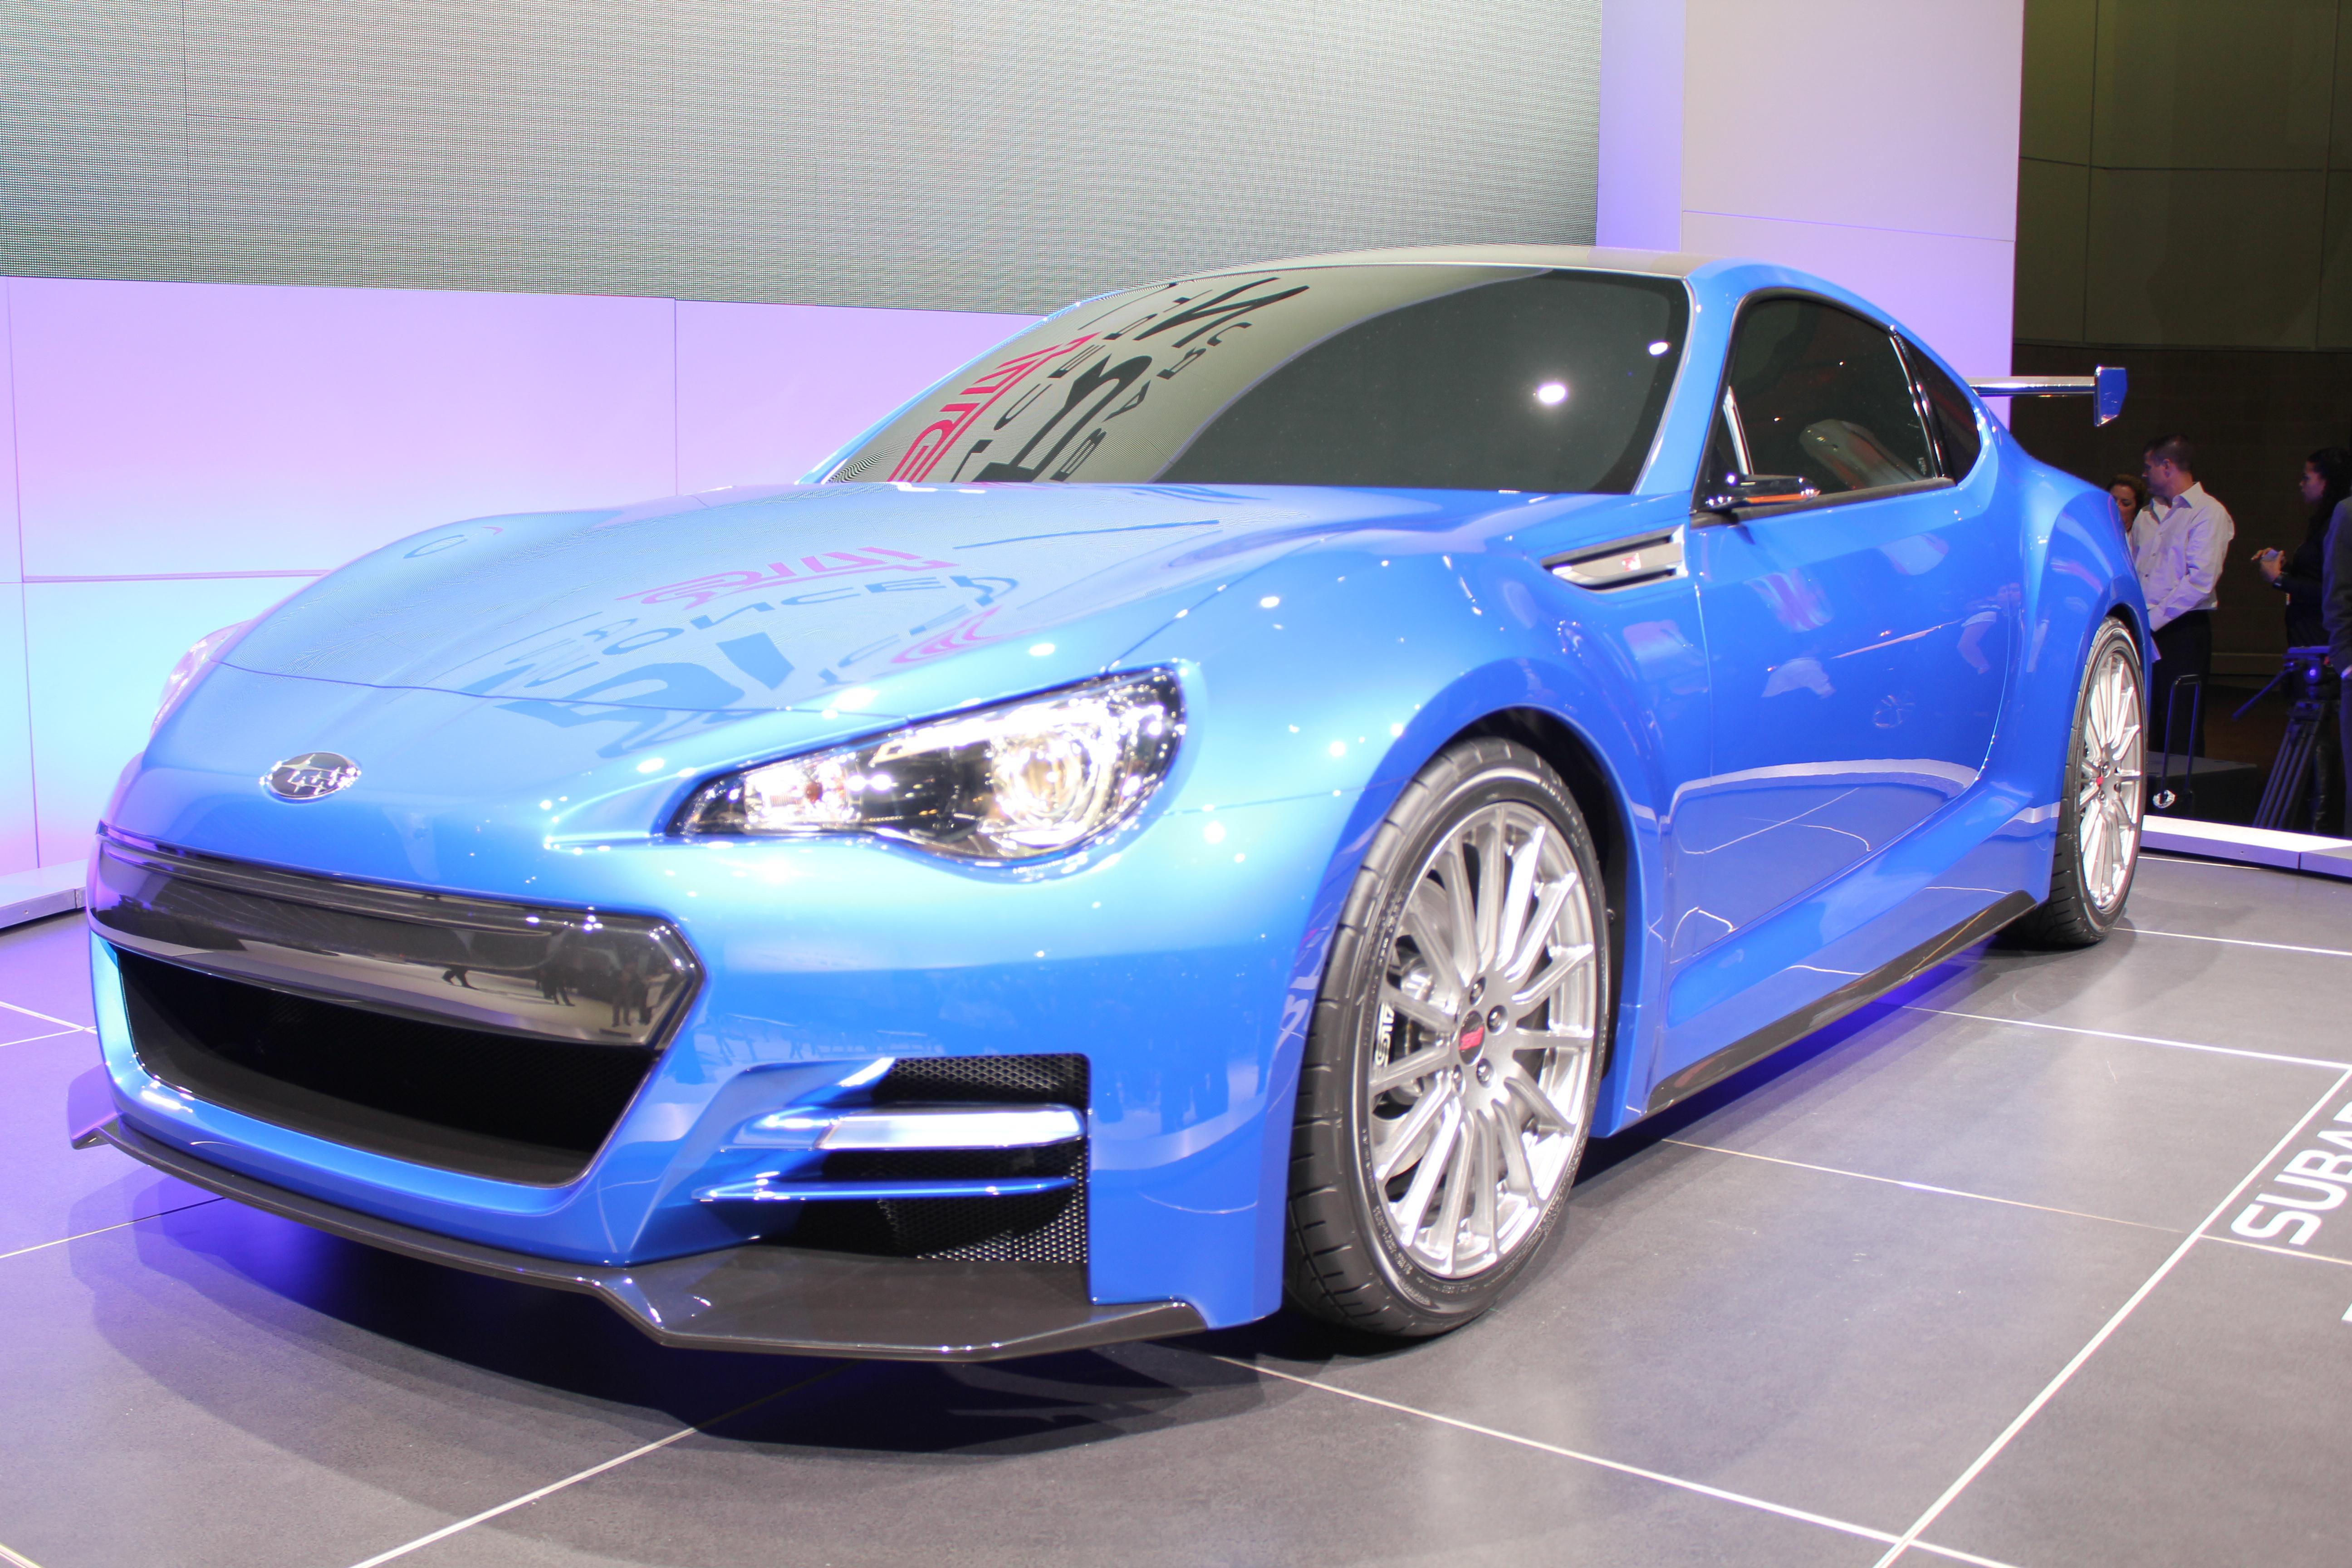 File:Blue Car 1224.jpg - Wikimedia Commons